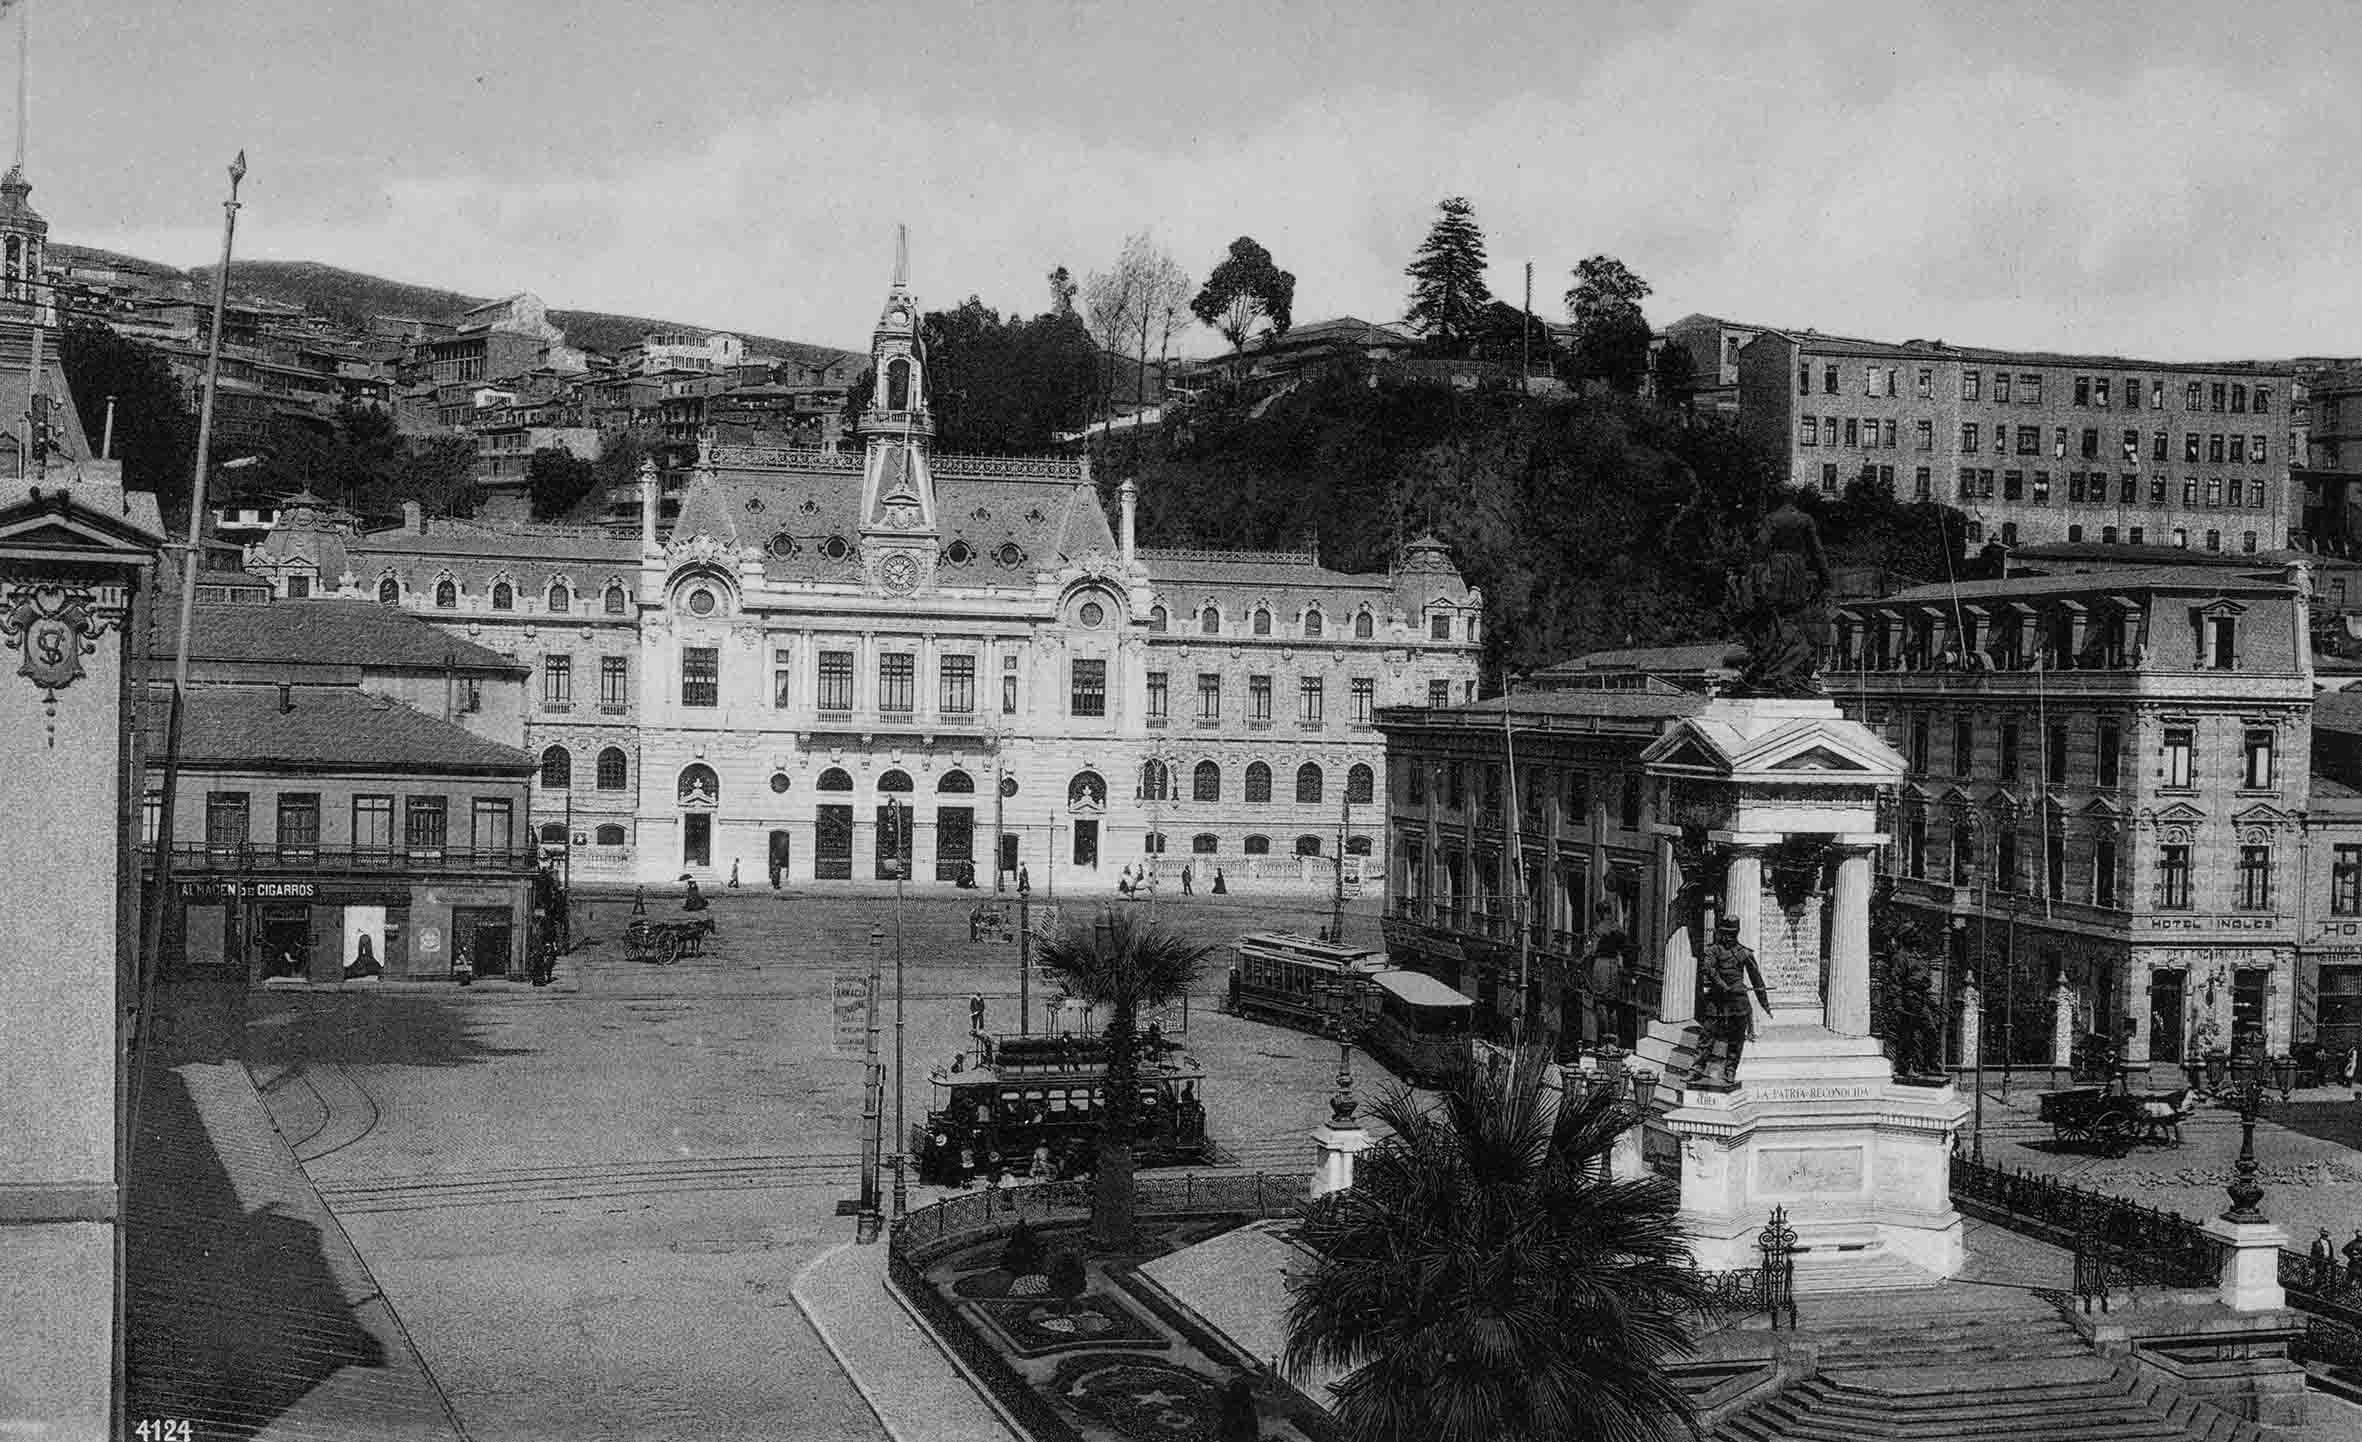 Enterreno - Fotos históricas de chile - fotos antiguas de Chile - Plaza Sotomayor ca. 1910